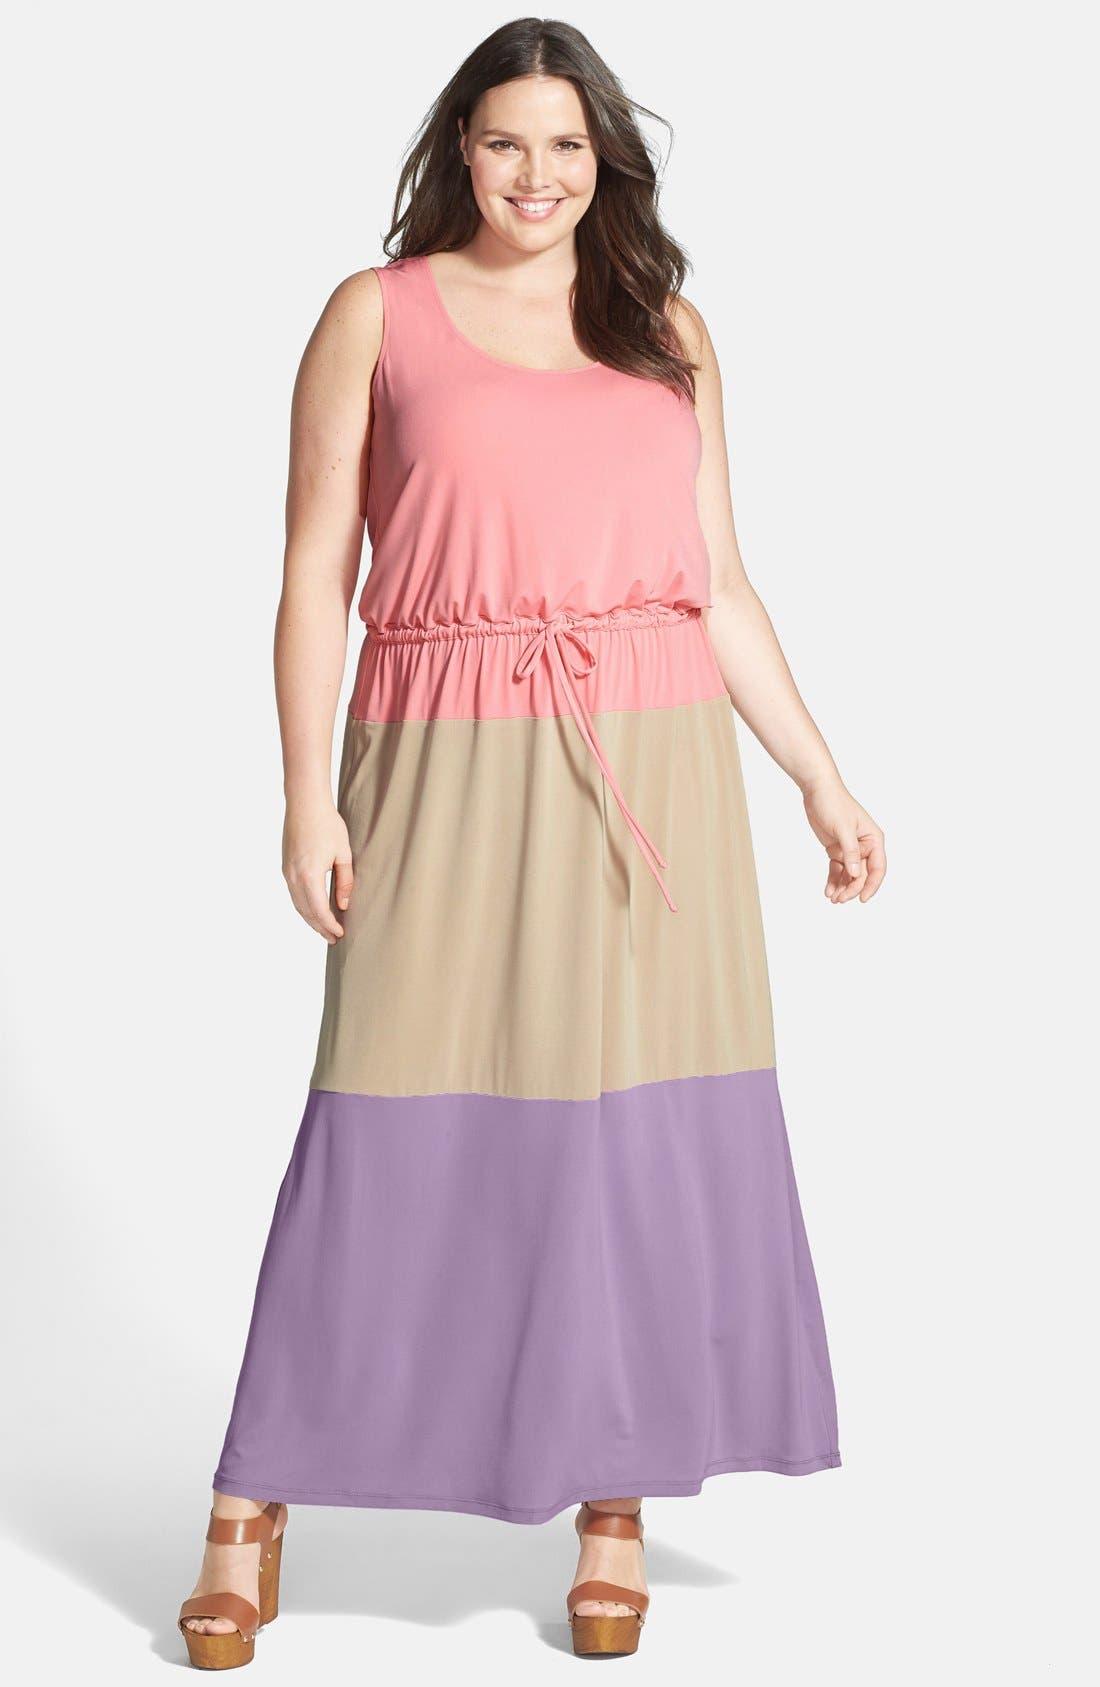 Alternate Image 1 Selected - London Times Colorblock Print Matte Jersey Maxi Dress (Plus Size)